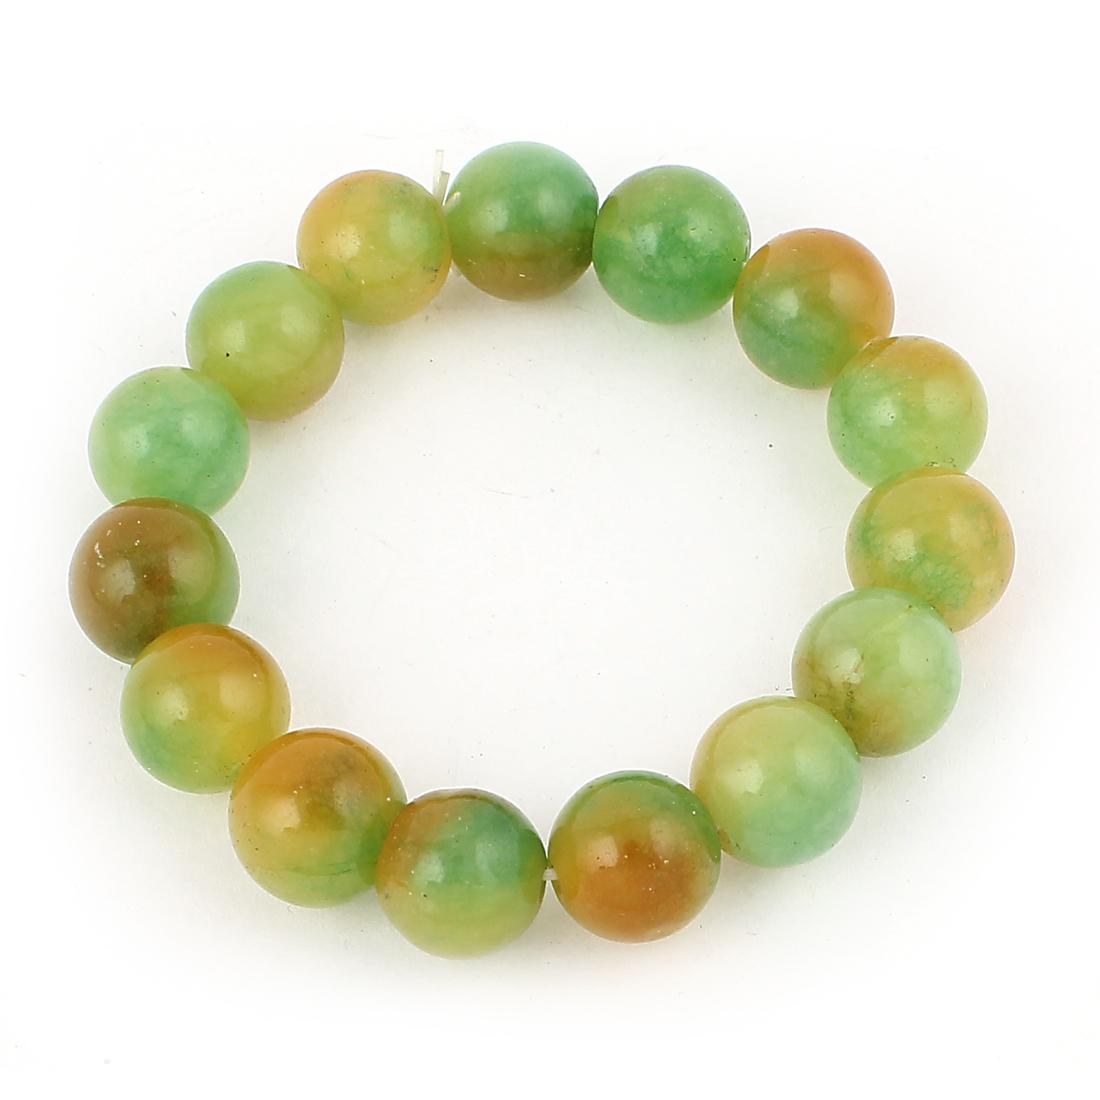 Lady Jewelry Faux Jade Decor Elastic Wrist Stretchy Bangle Bracelet